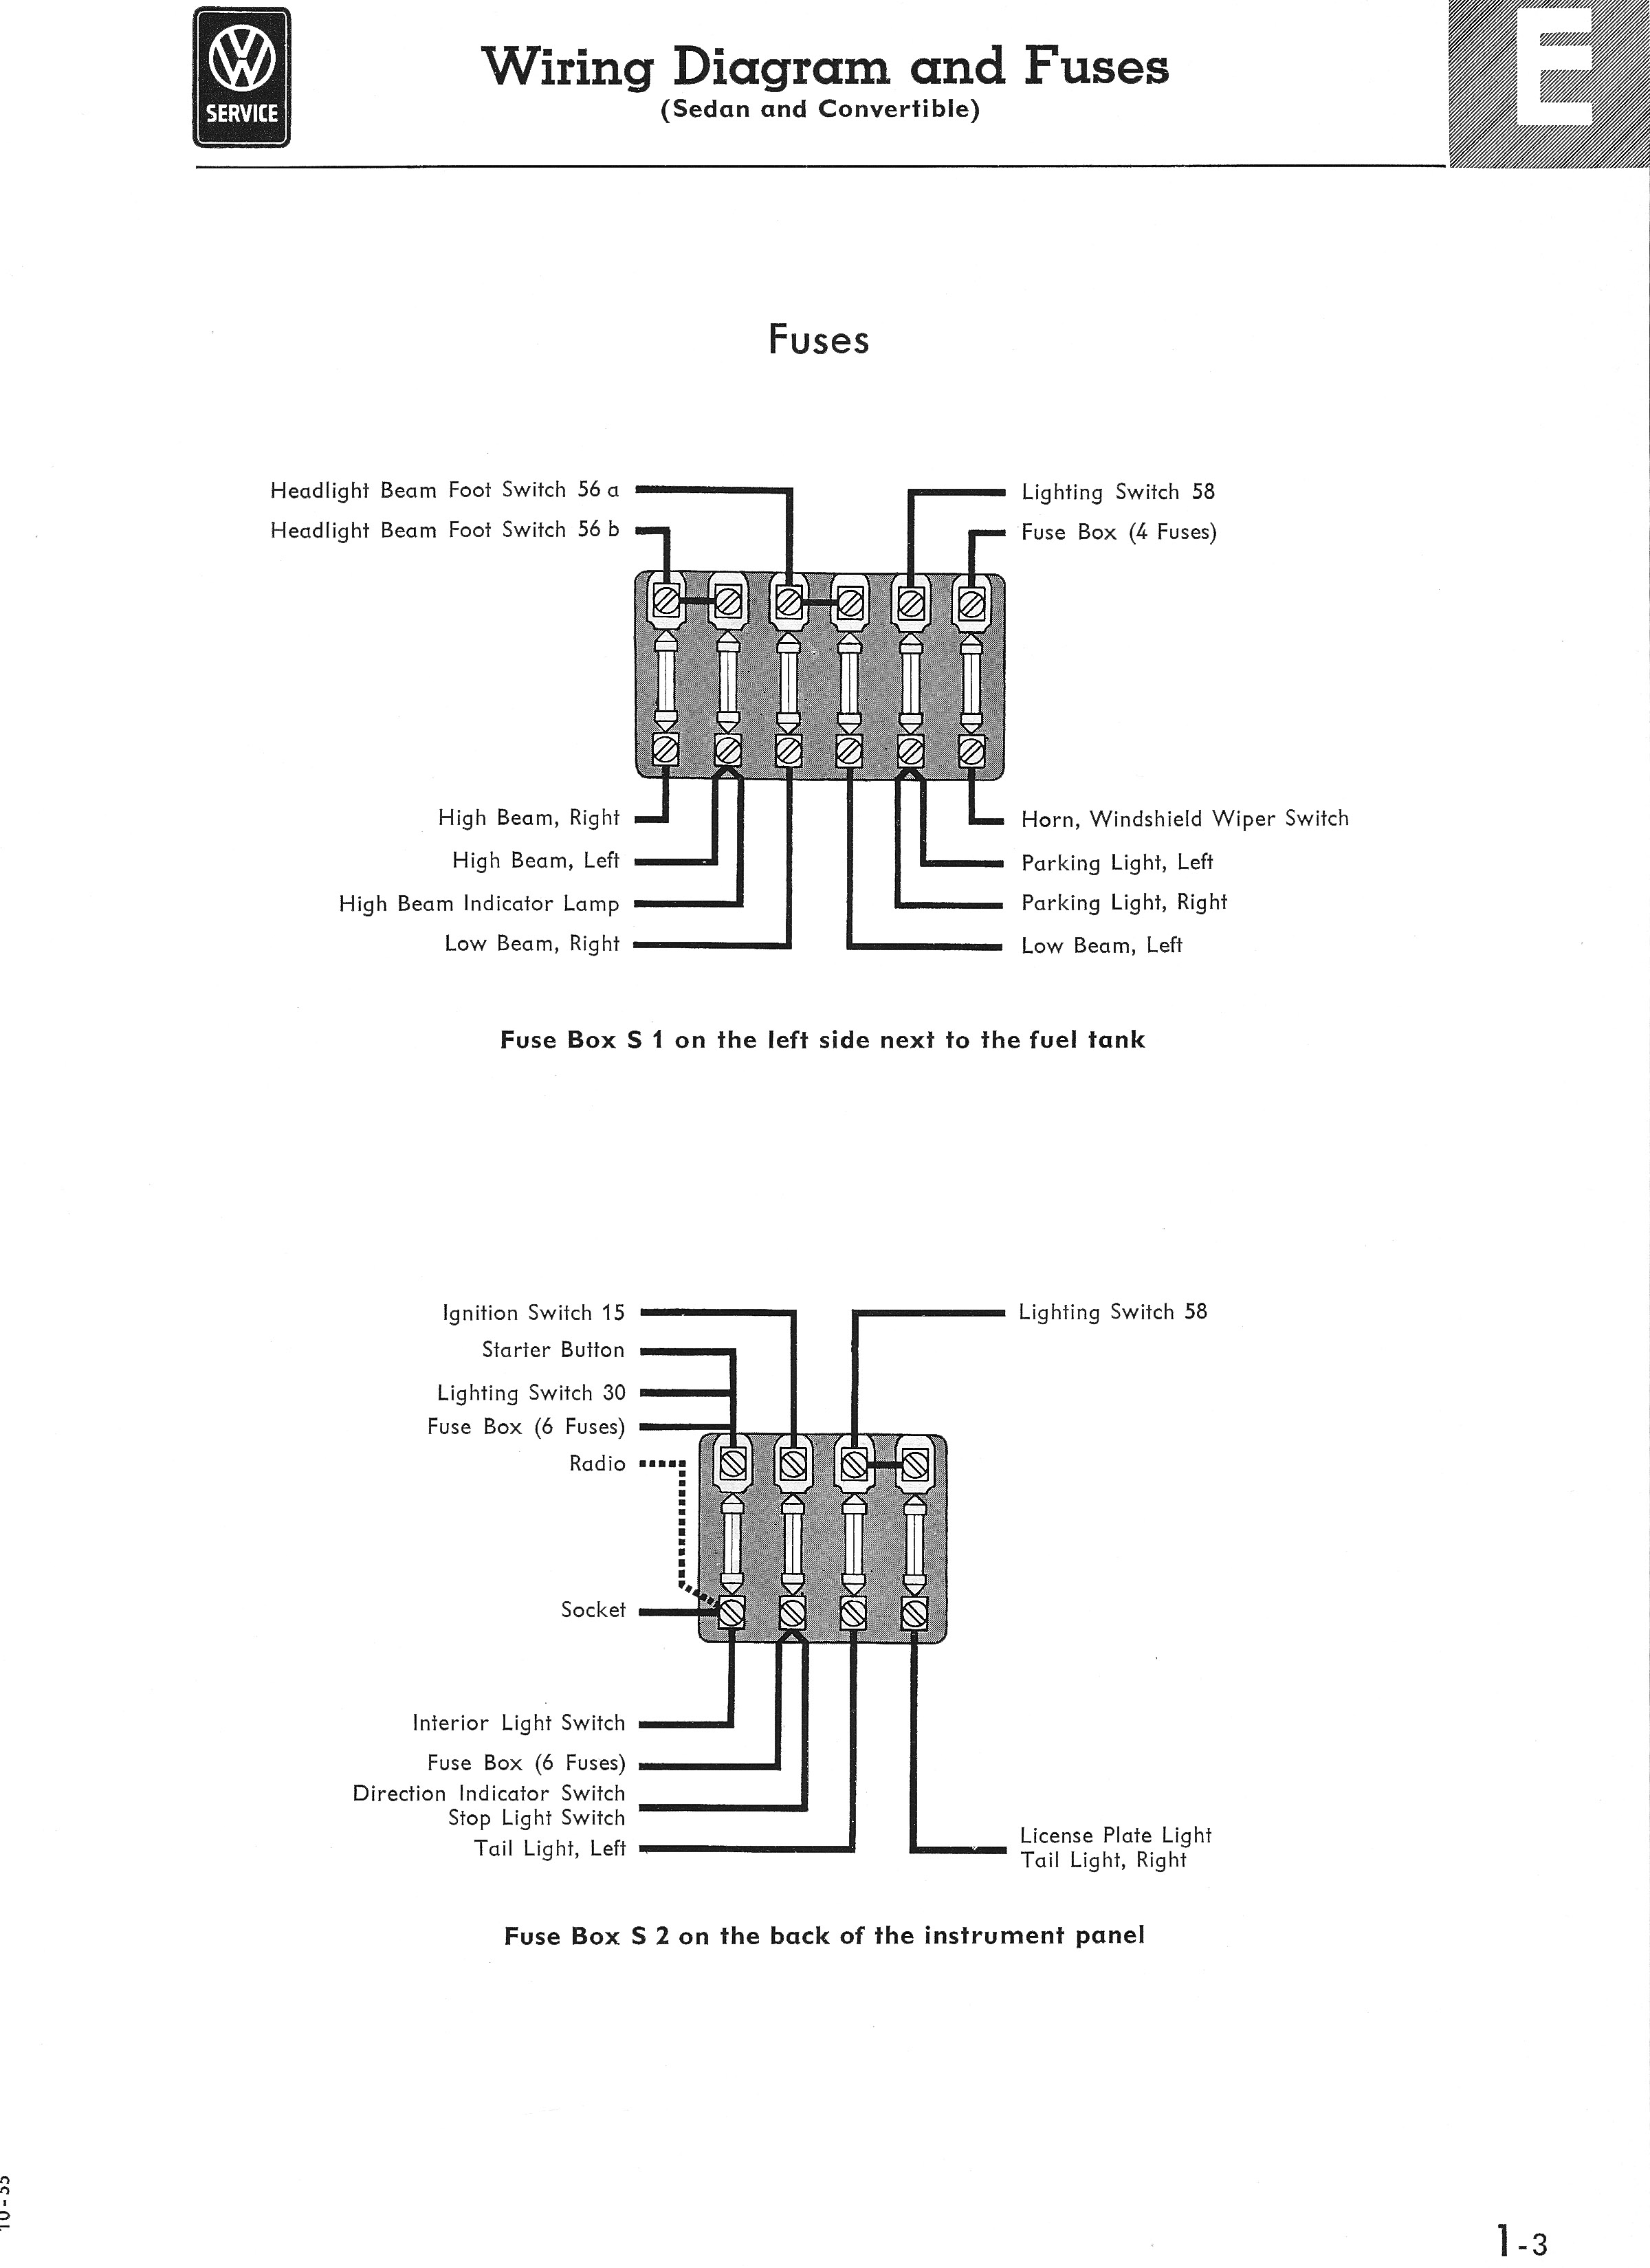 bug_5253_fuses_300dpi?resize=665%2C914 sew eurodrive wa20drs71s4 wiring diagram sew wiring diagrams sew drn motor wiring diagram at soozxer.org